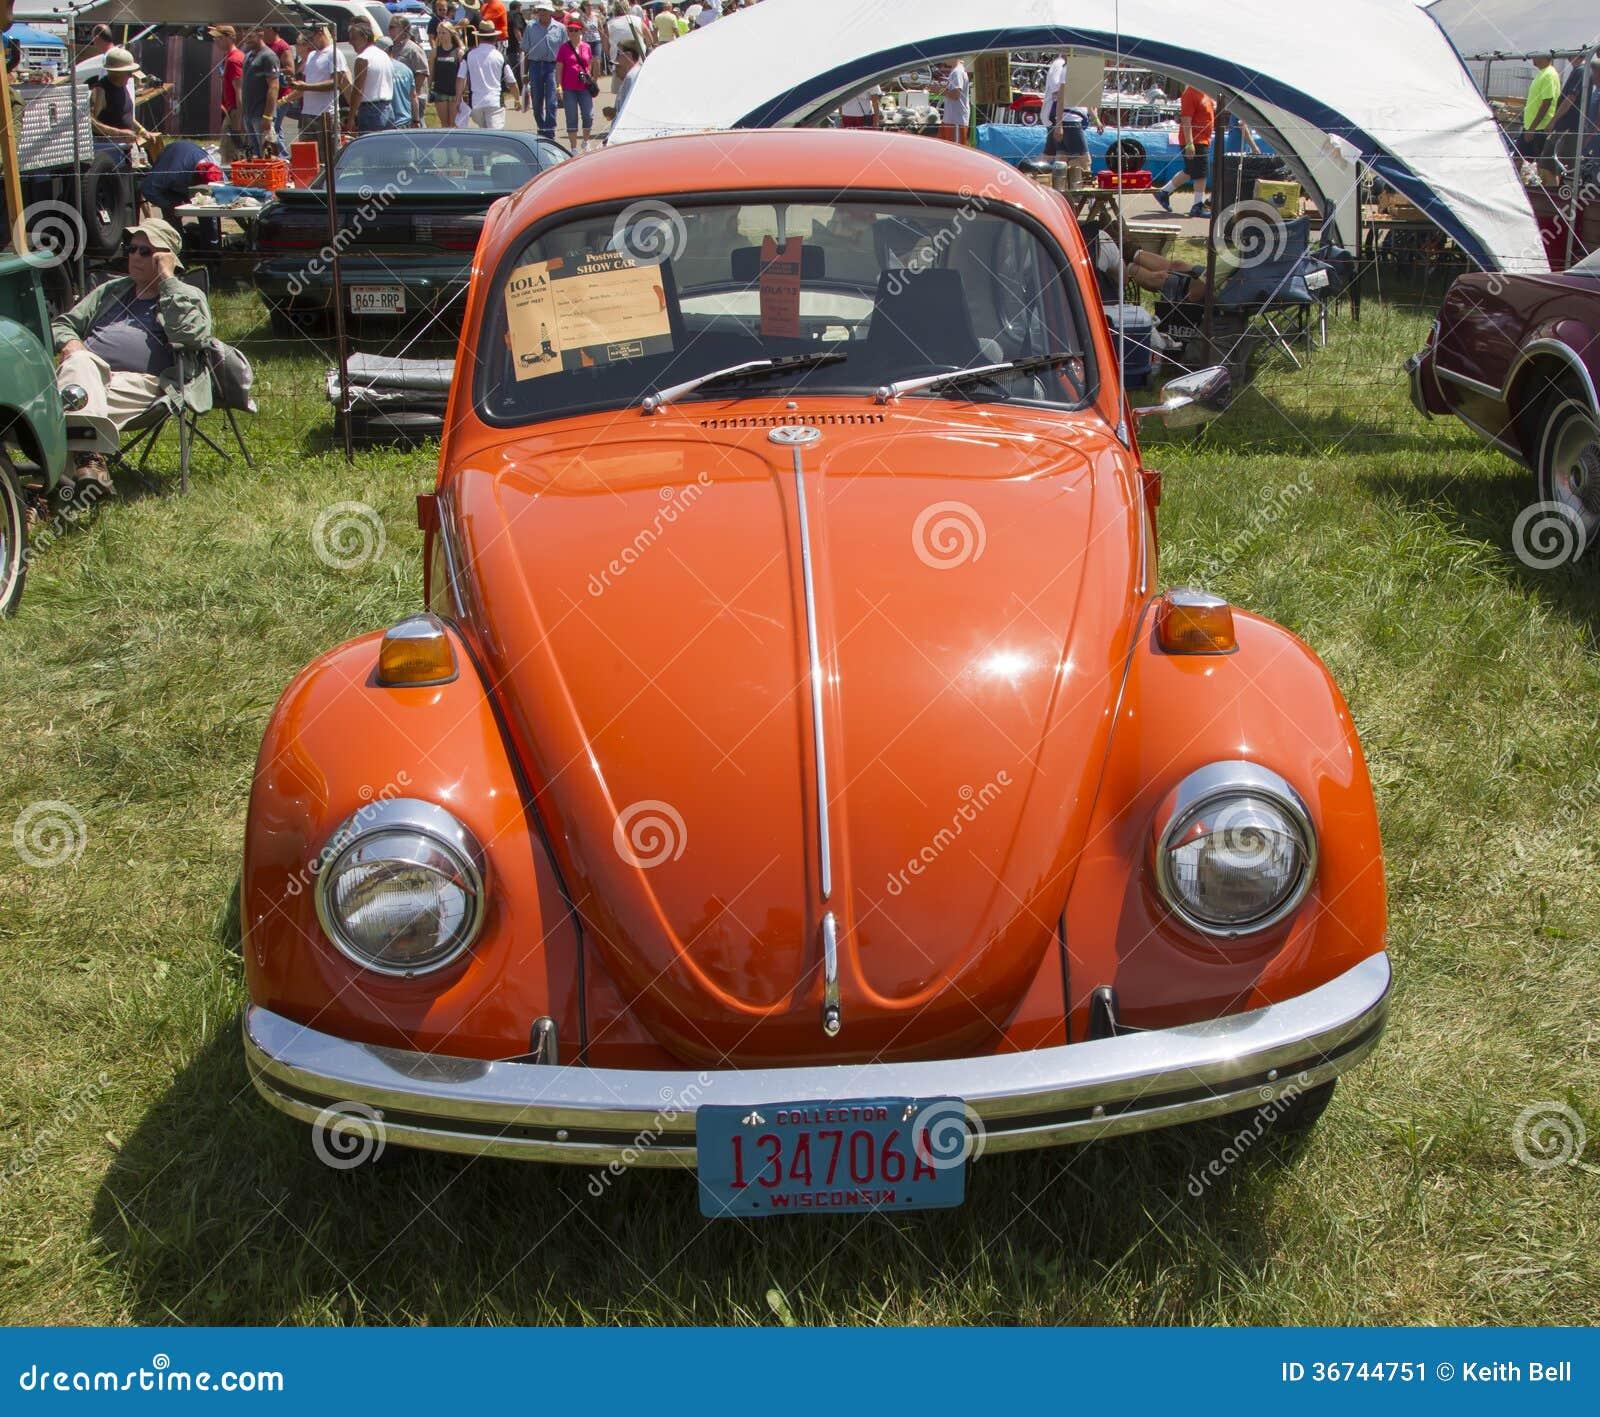 Orange Vw Beetle Front View Iola Wi July Car Iola St Annual Car Show July Iola Wisconsin